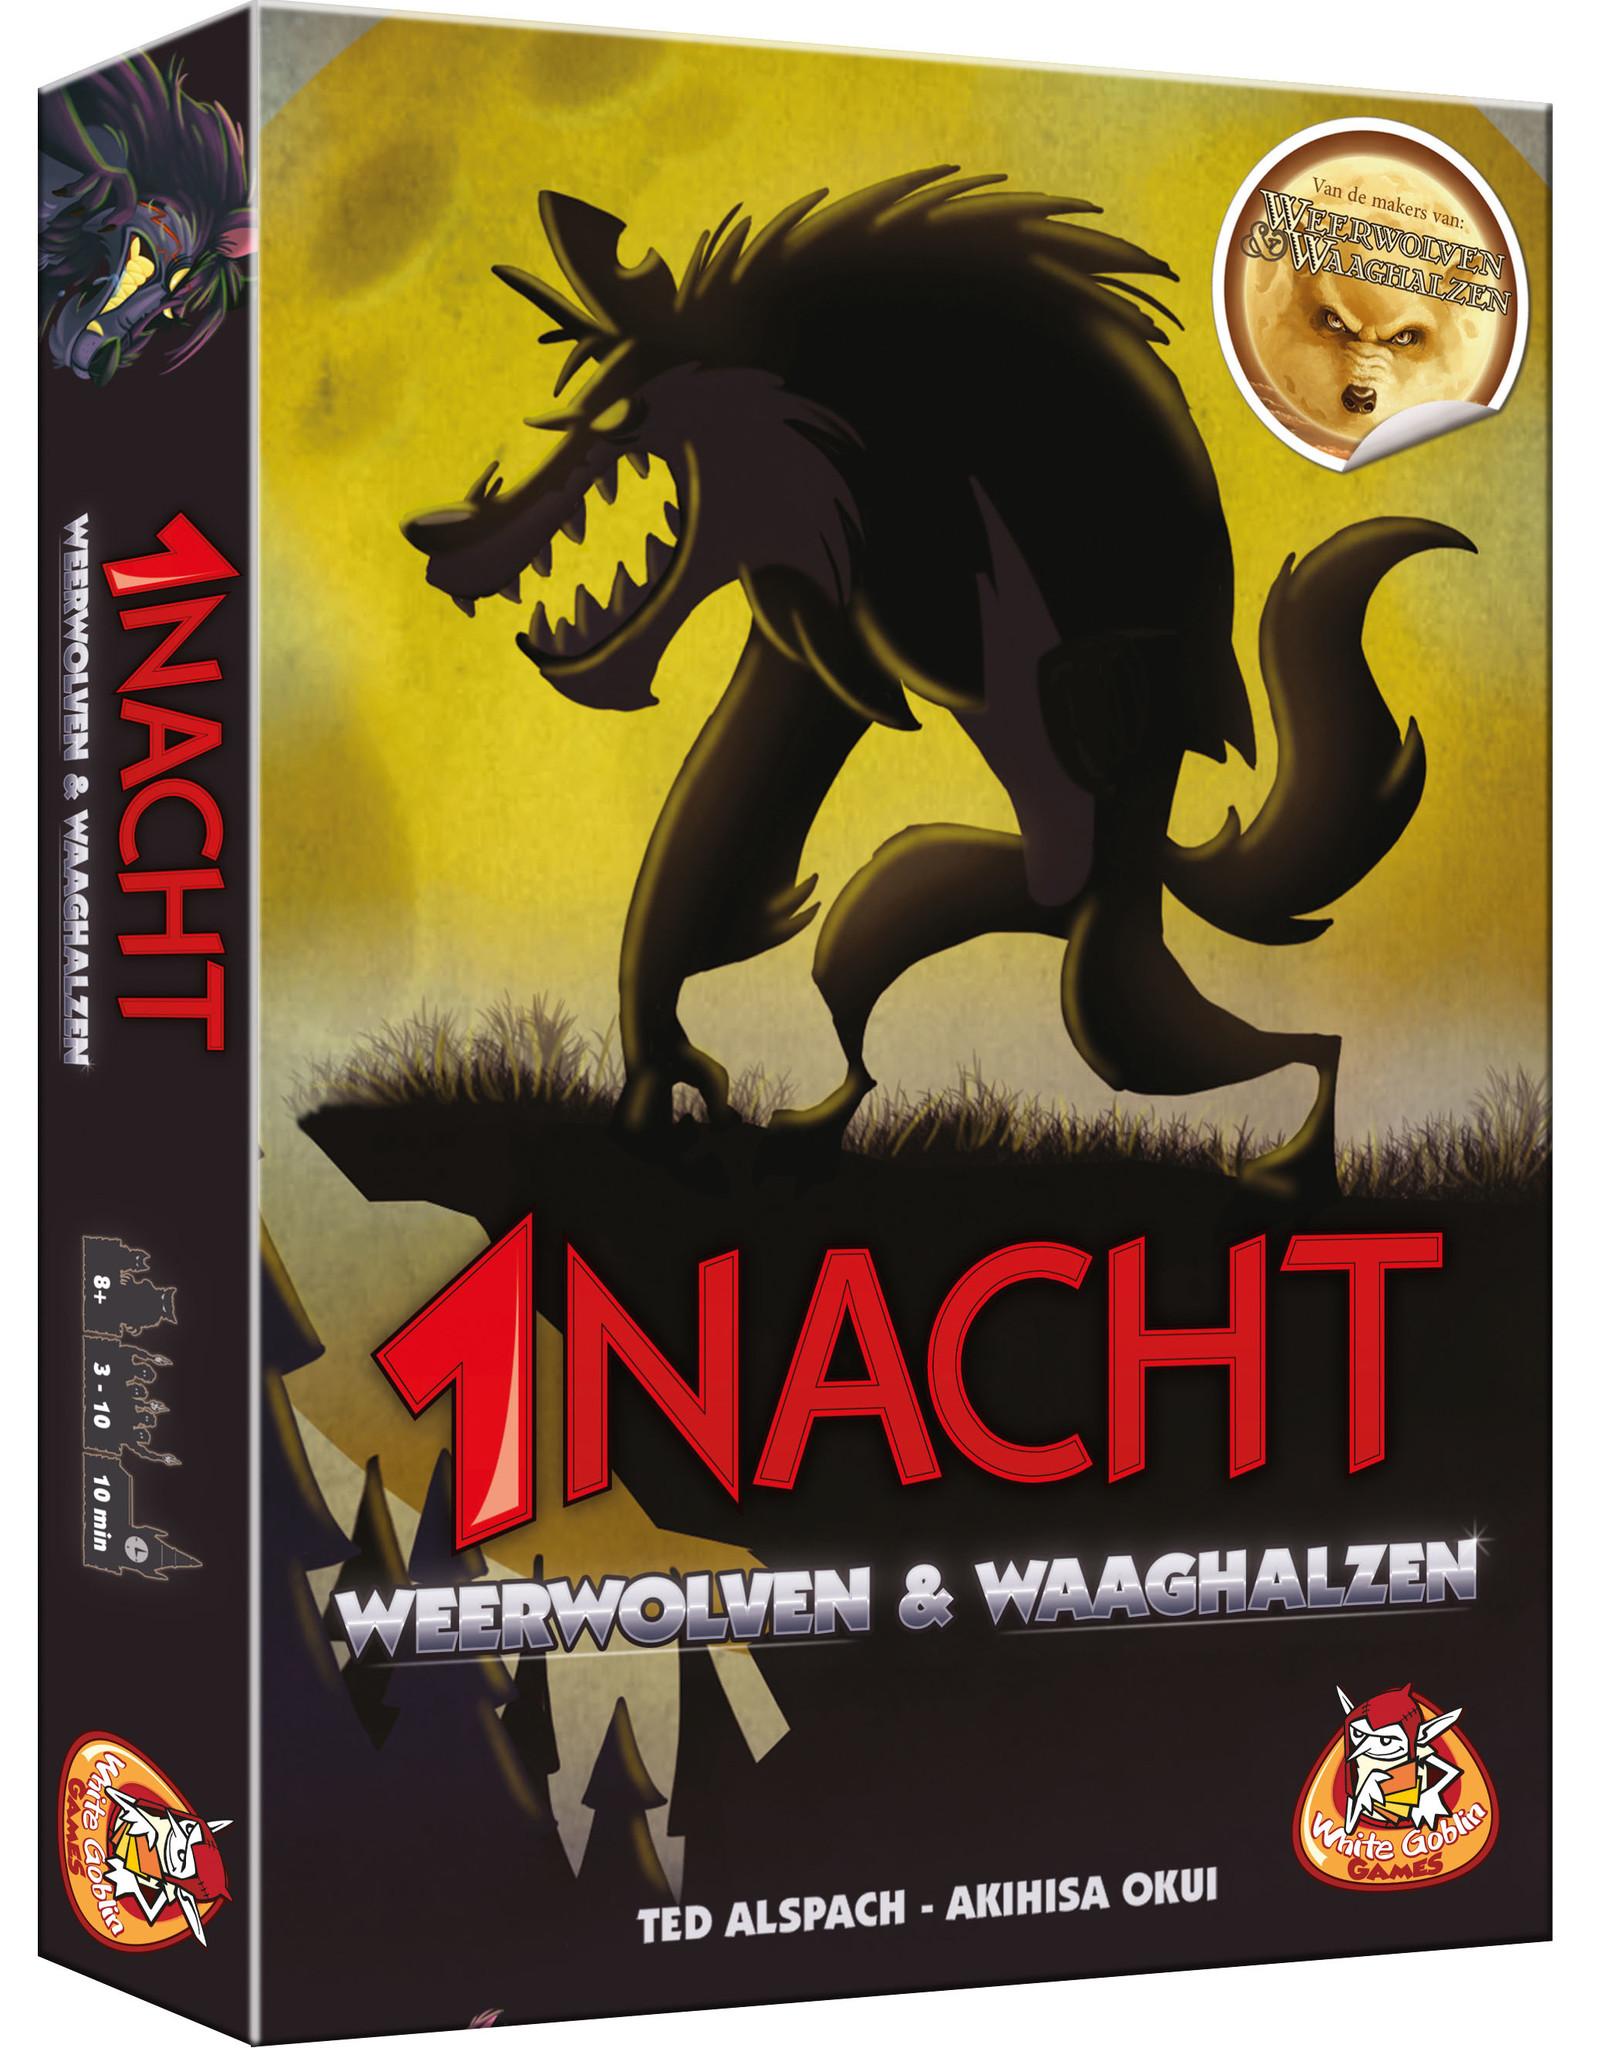 White Goblin Games 1 Nacht Weerwolven en Waaghalzen (NL)